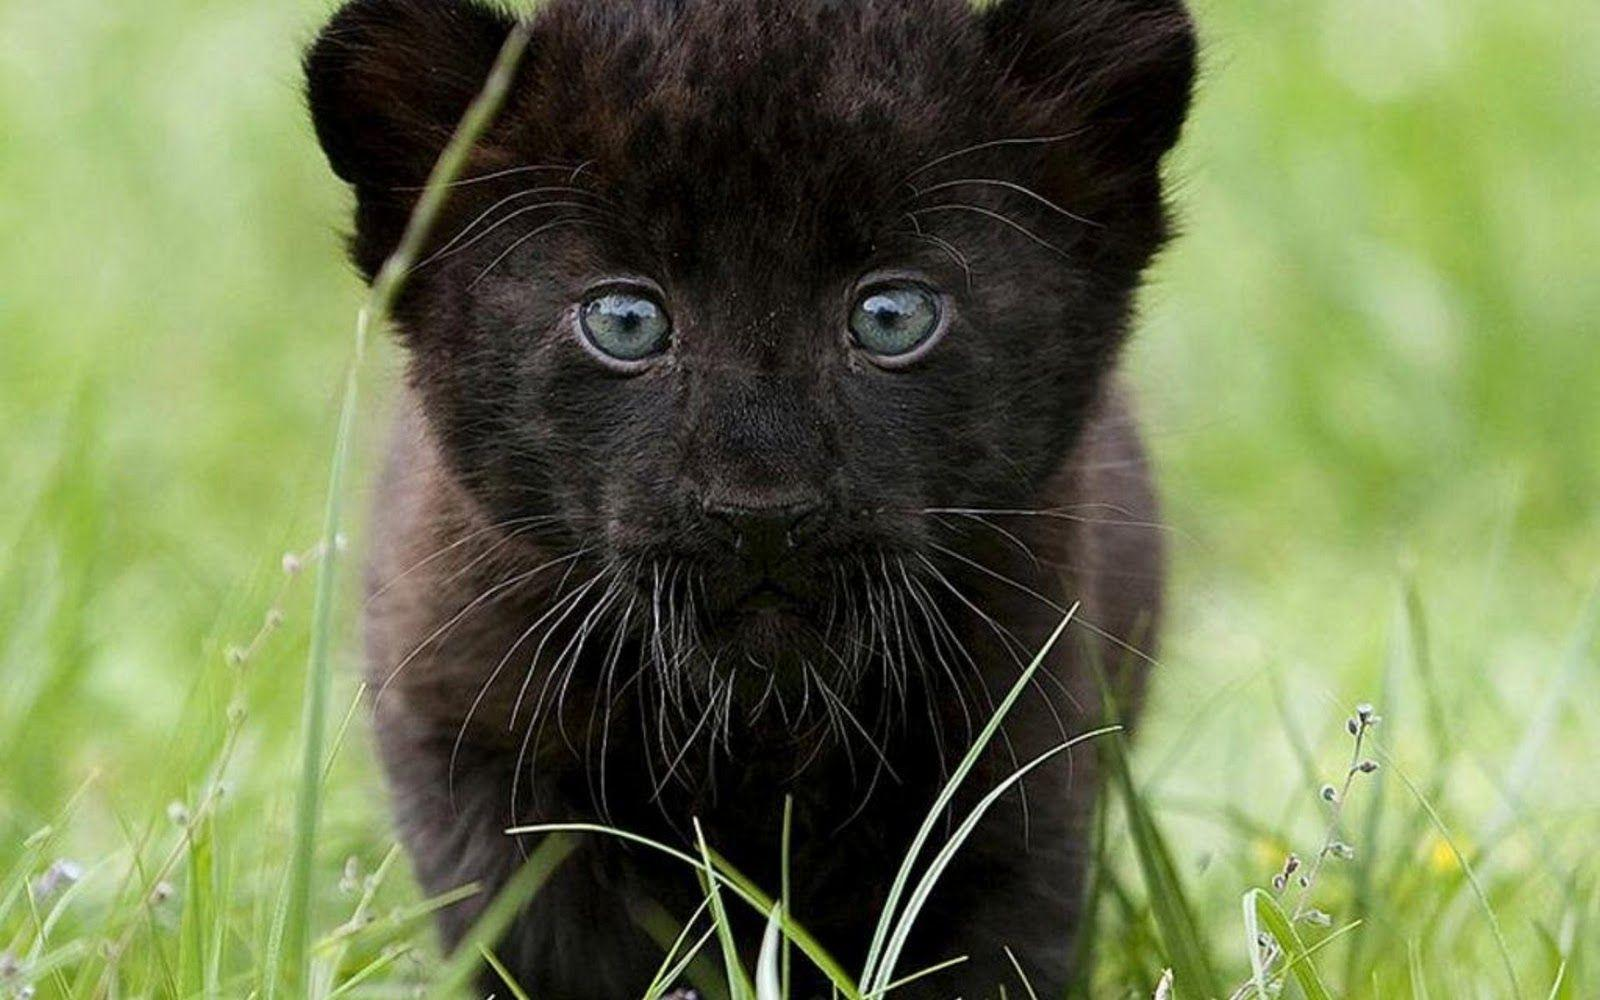 Black Panther Animal Wallpapers - Wallpaper Cave